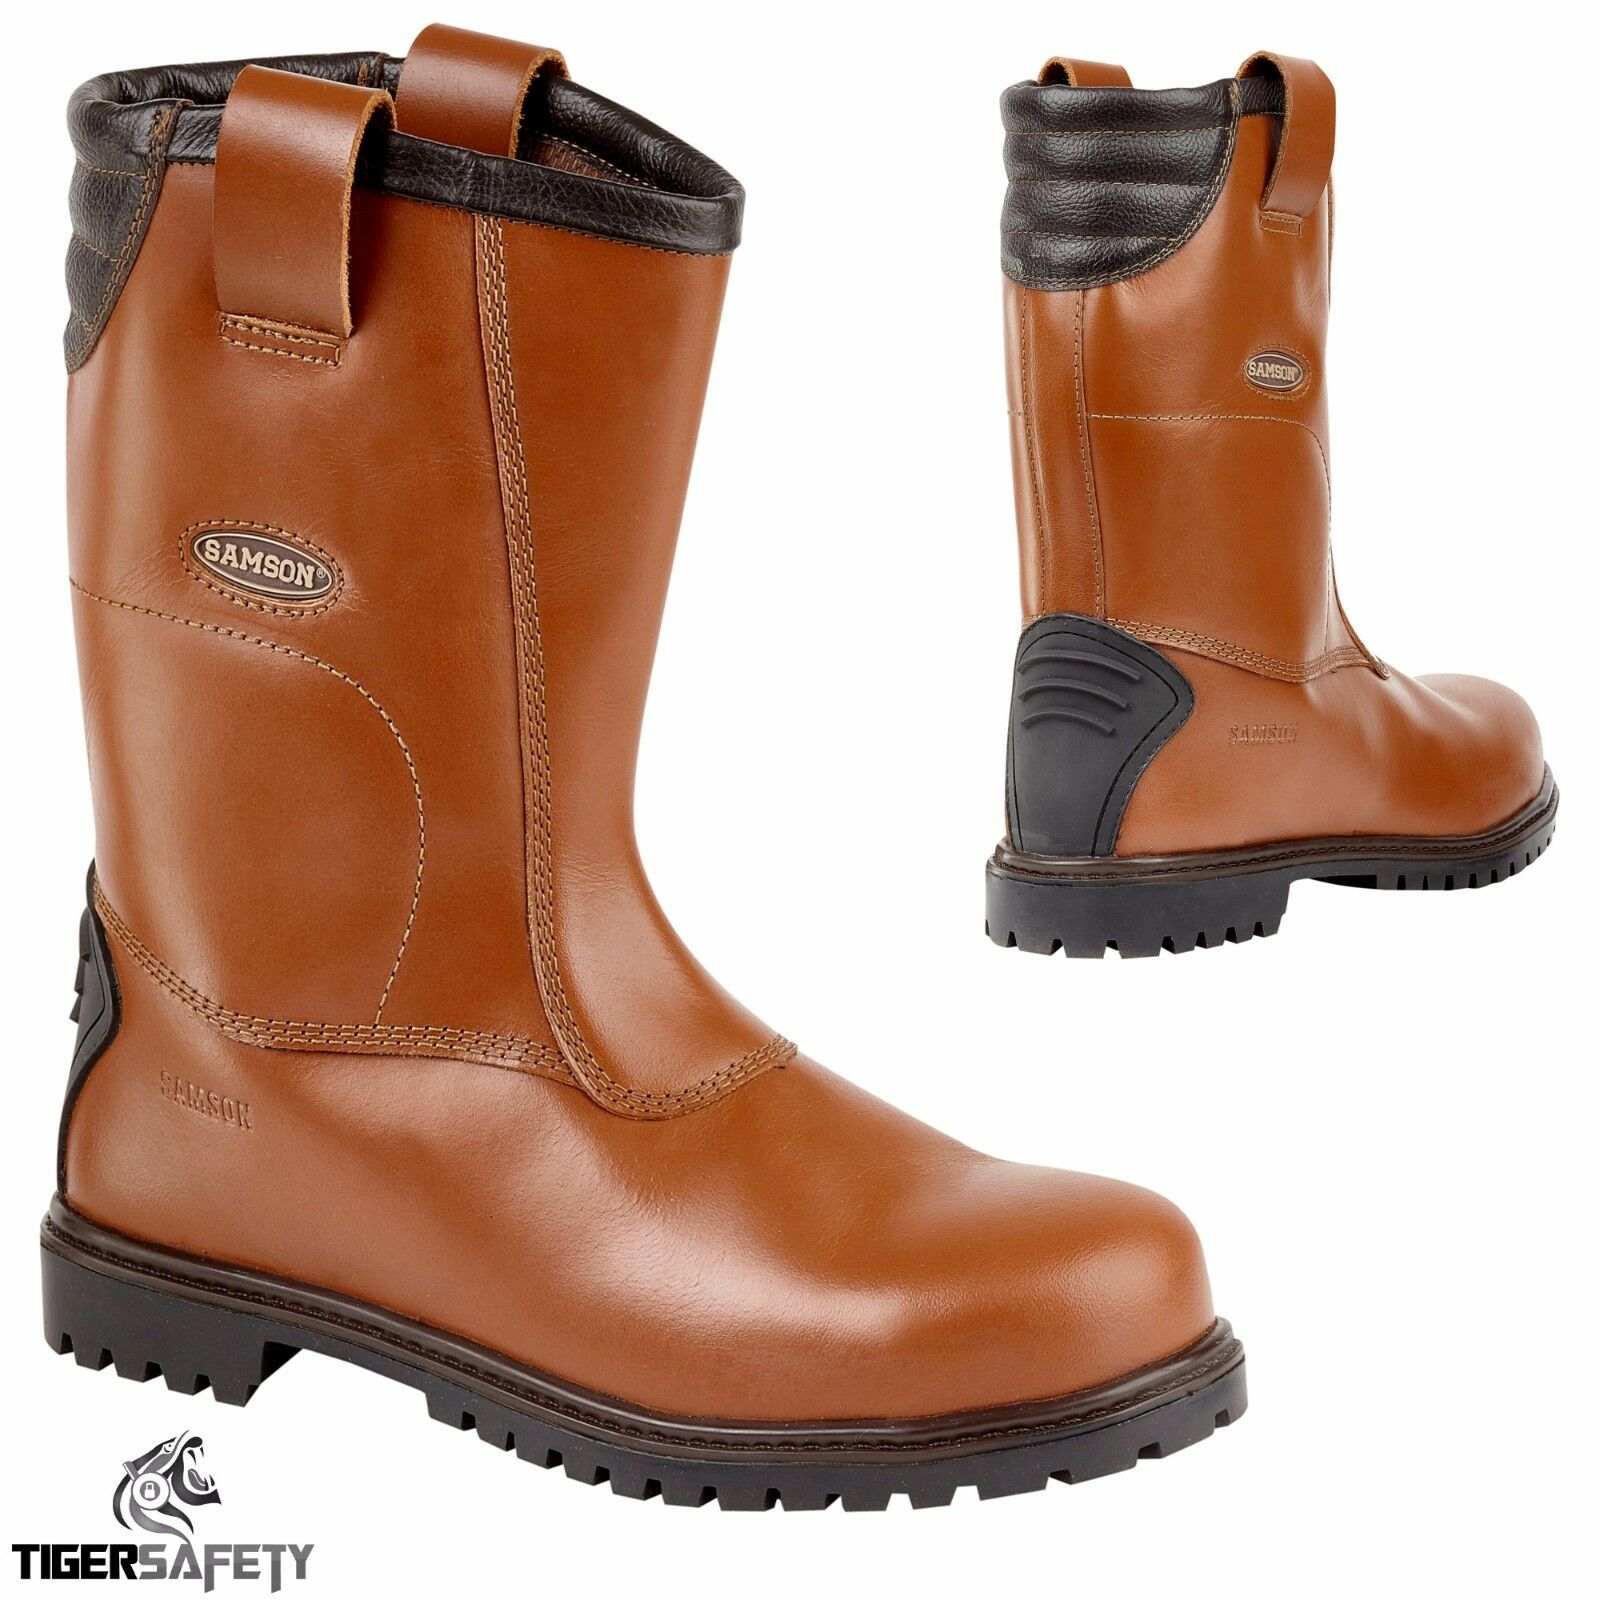 Samson 7051 S3 SRC Brown Redskin Steel Toe Cap Safety Rigger Boots Work Boot PPE